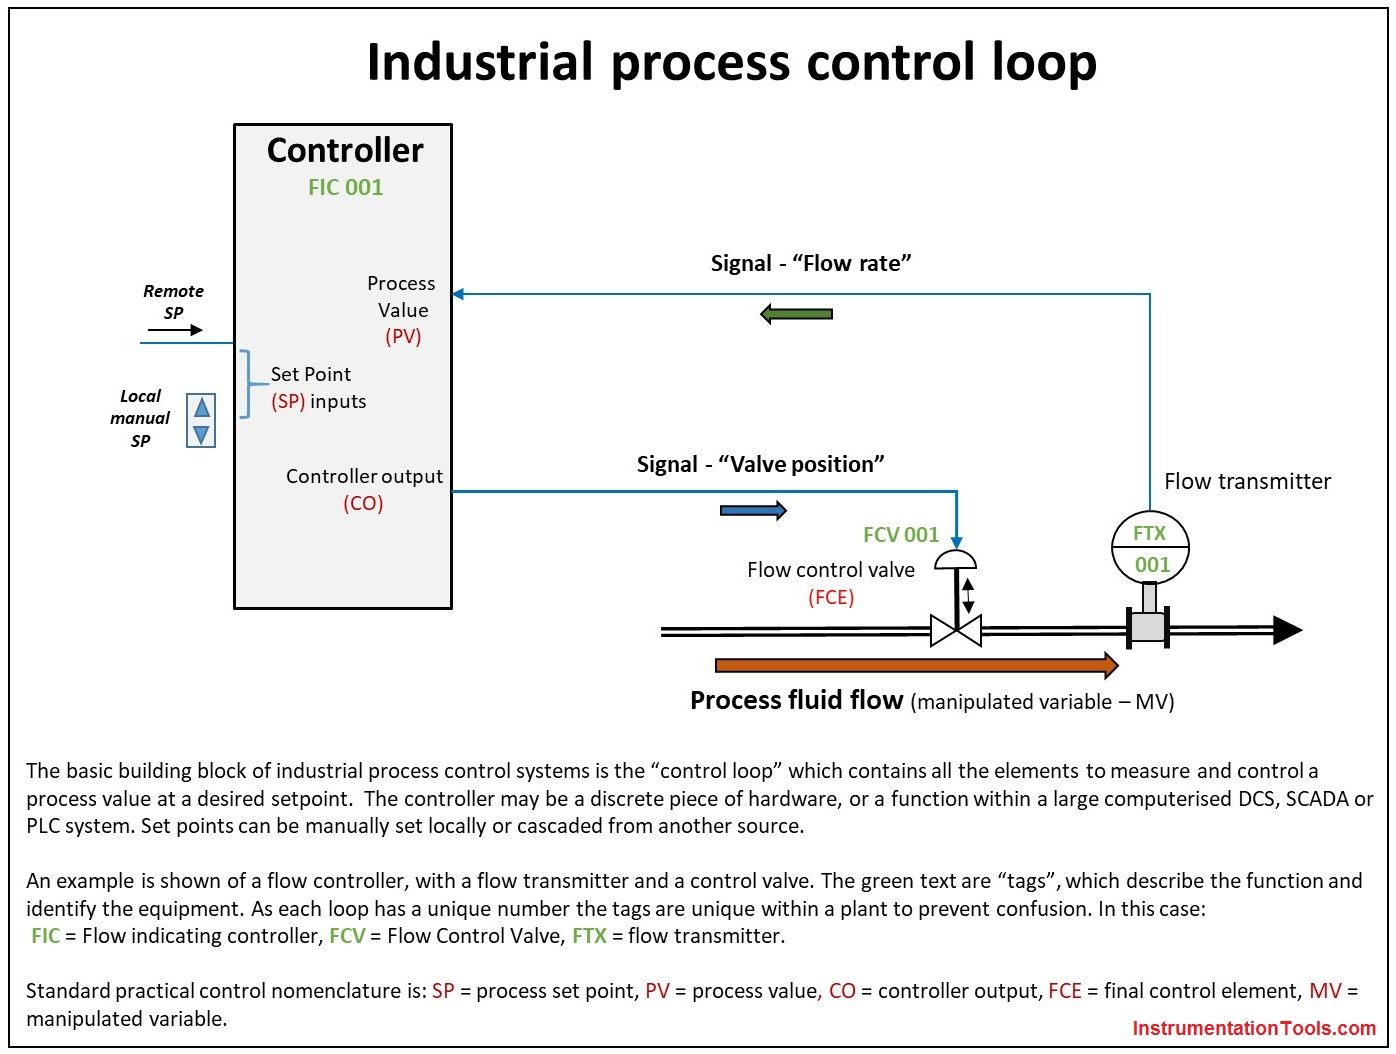 hight resolution of industrial process control loop jpg1396x1054 231 kb